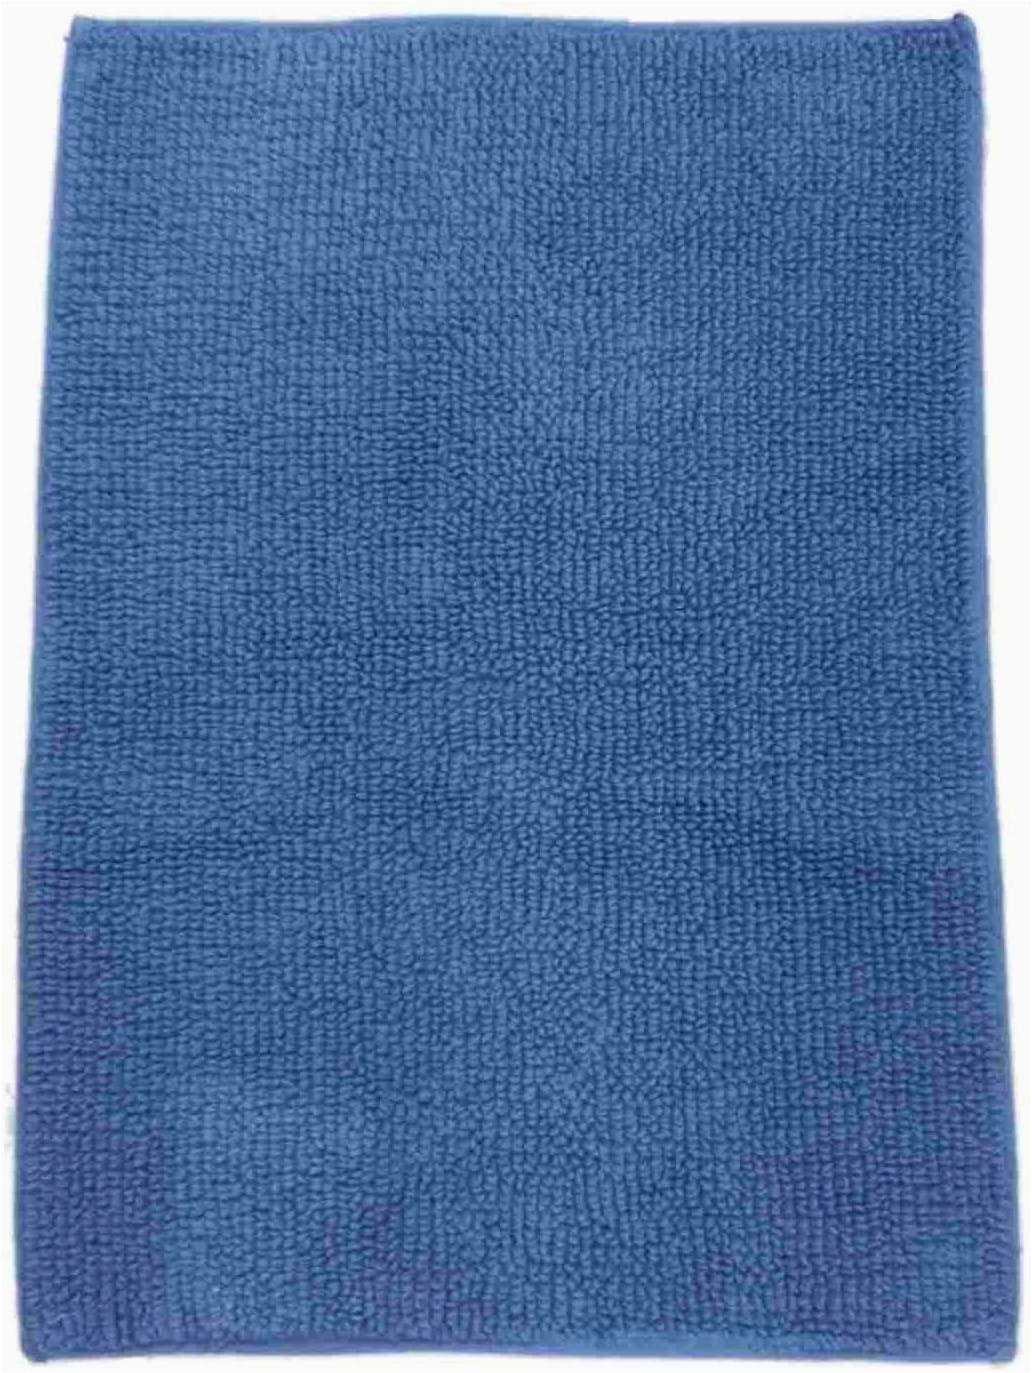 Sonoma Bath Rugs at Kohls Amazon sonoma Reversible Blue Plush Pile Throw Rug